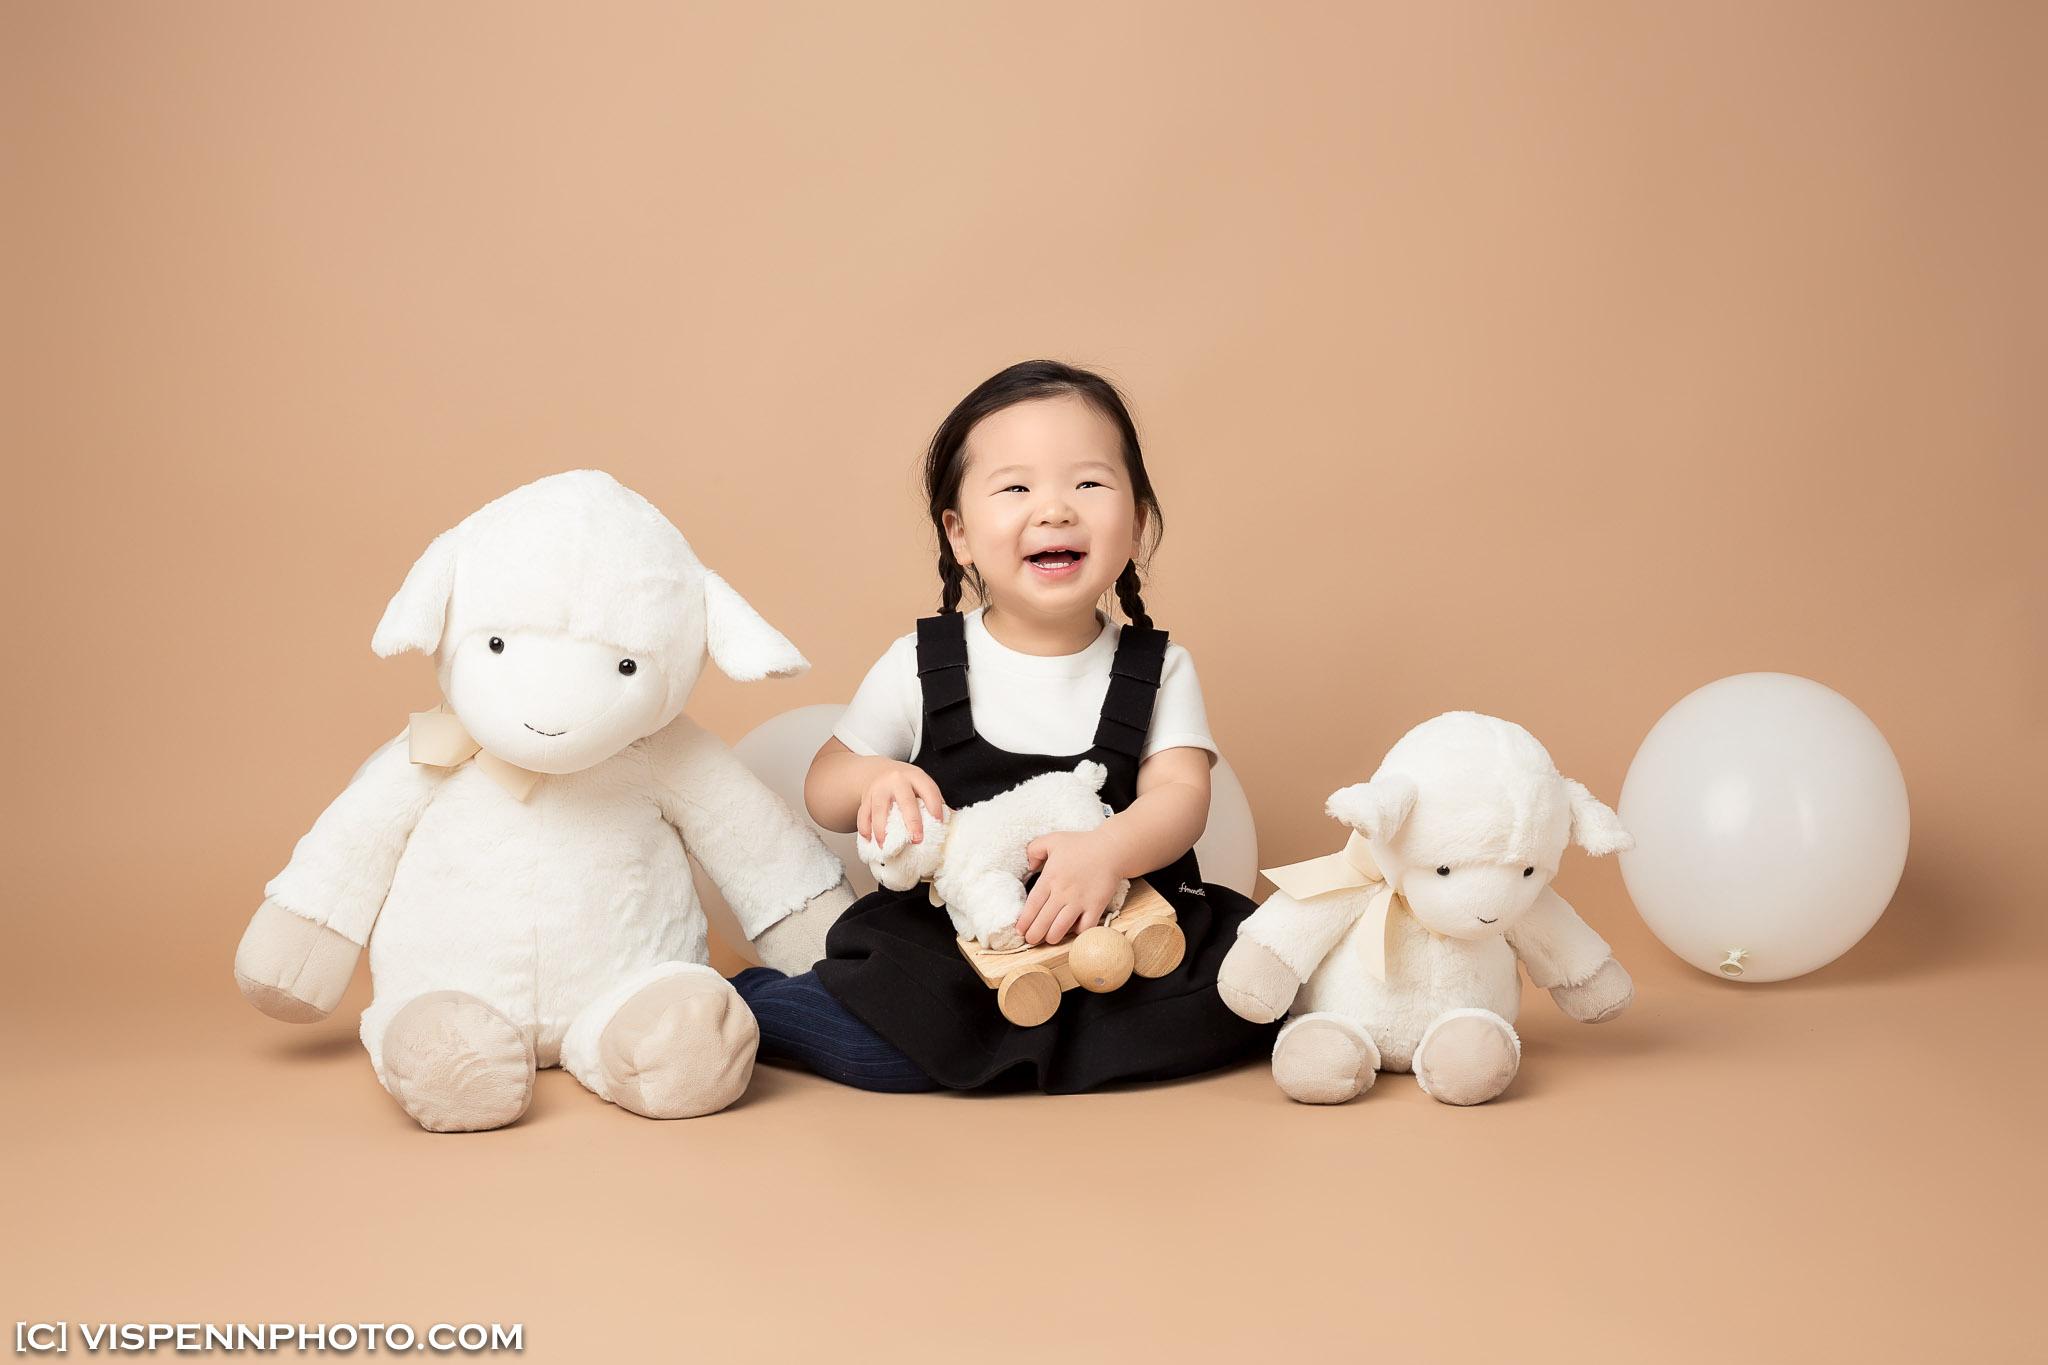 Melbourne Newborn Baby Family Photo BaoBao VISPENN 墨尔本 儿童 宝宝 百天照 满月照 孕妇照 全家福 KIDS VISPENN LucasZ 0029